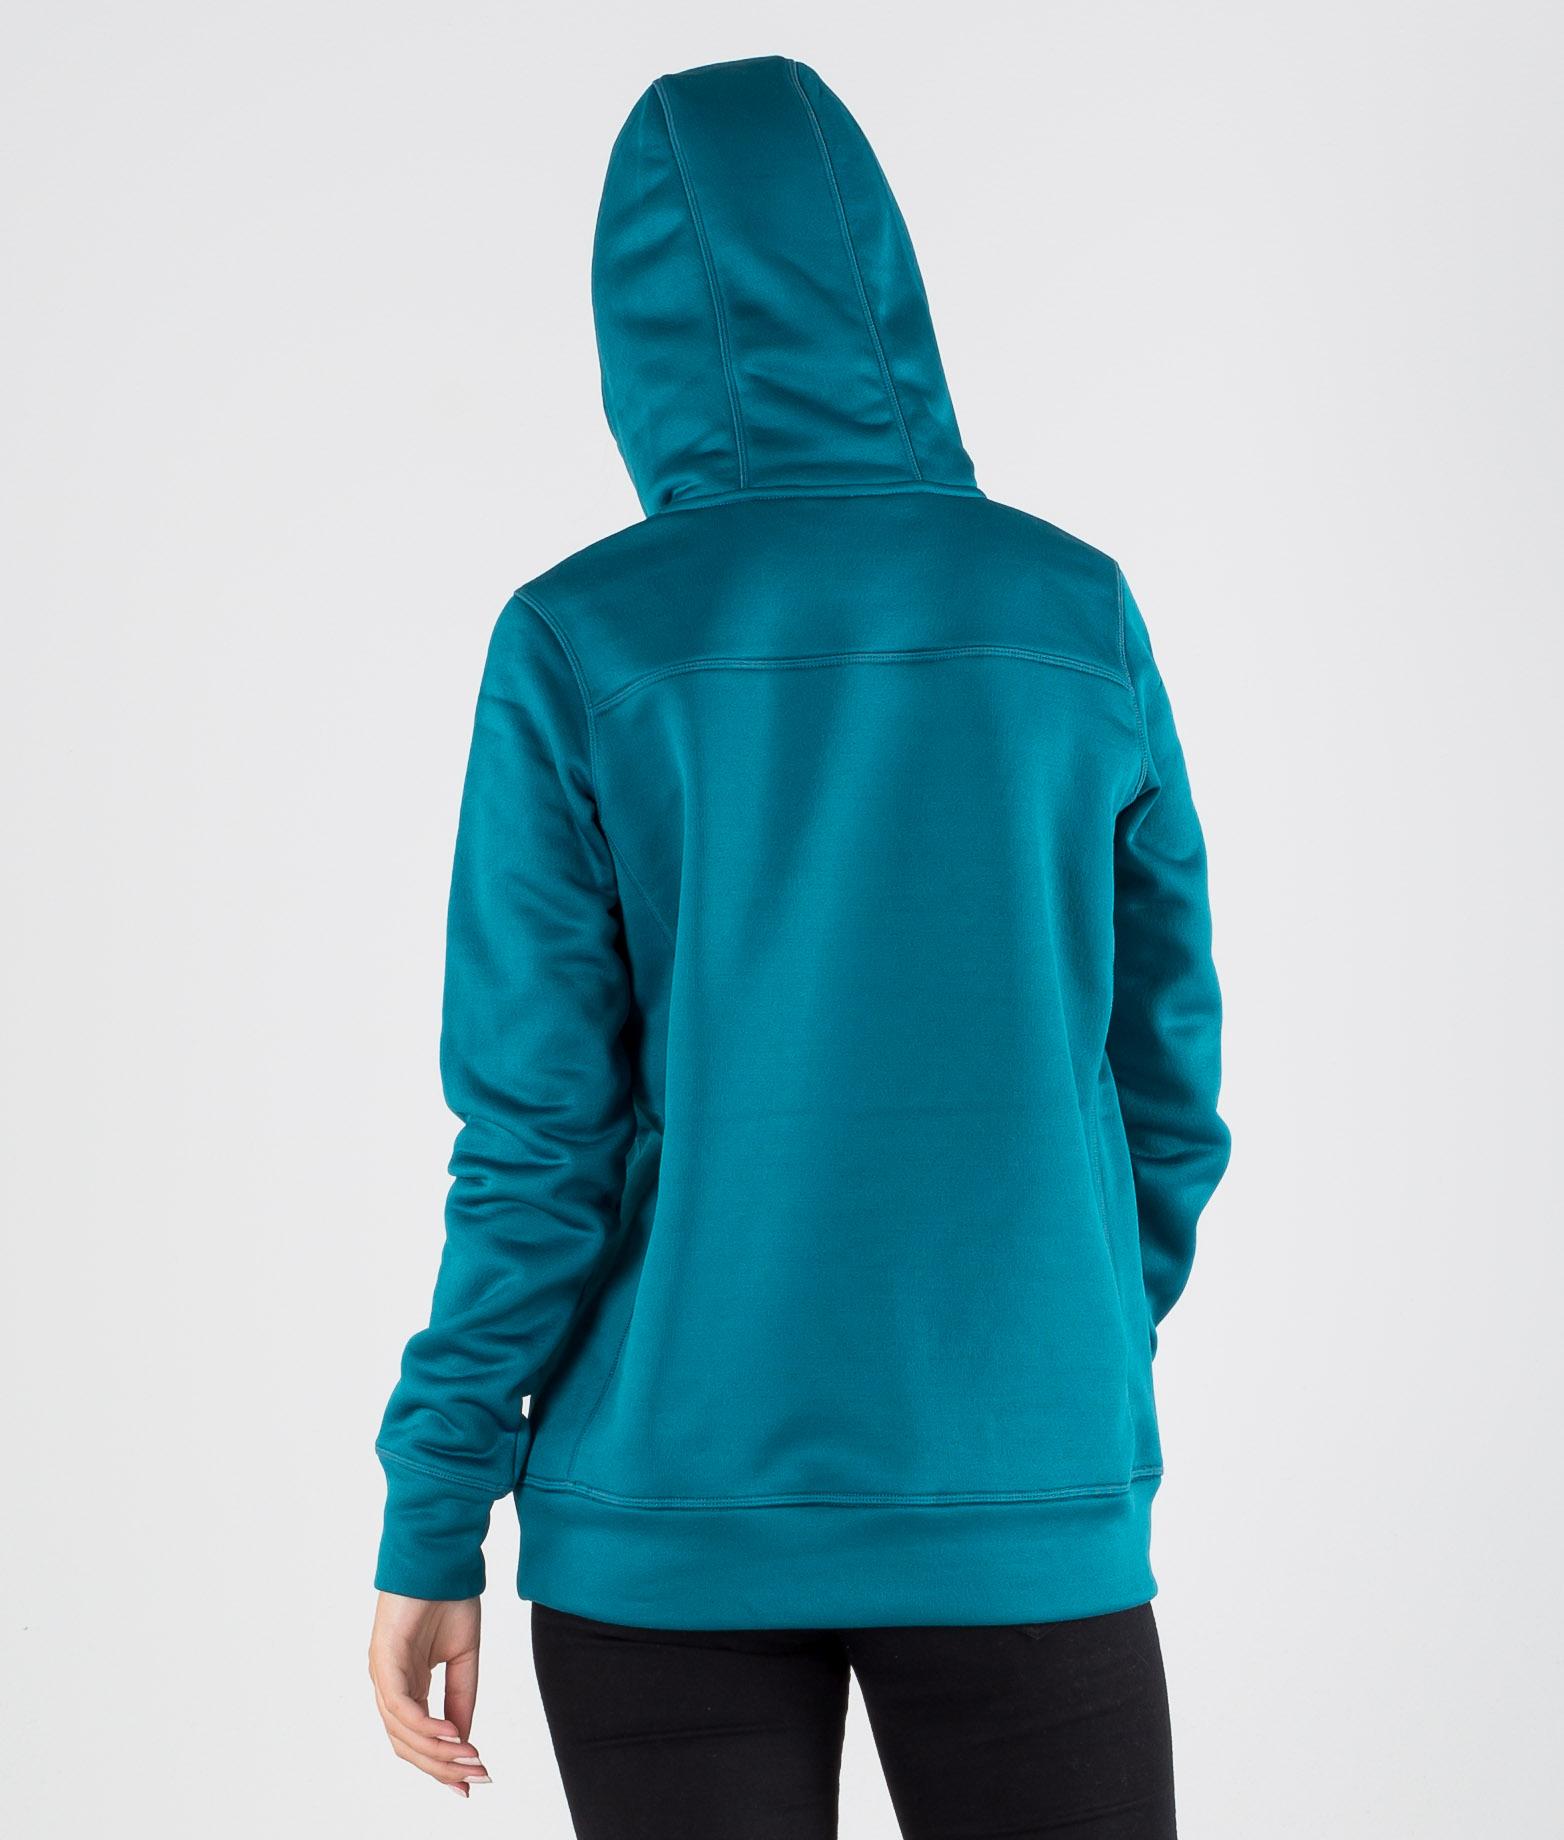 Burton Oak Solution Sweatshirt Deep Lake Teal